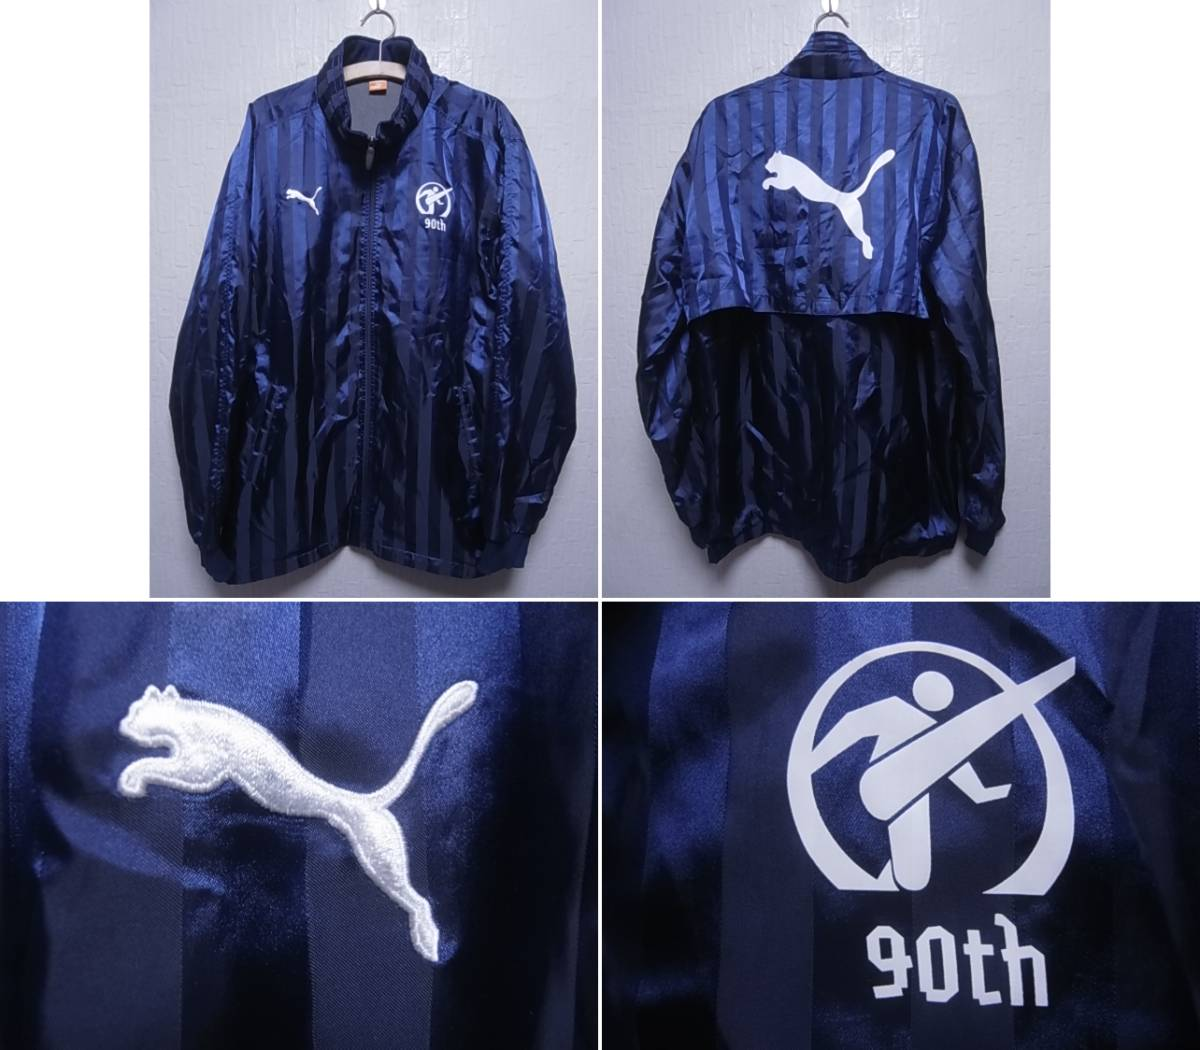 S32★プーマ Puma 第90回全国高校サッカー選手権大会 ナイロンJKT☆XO